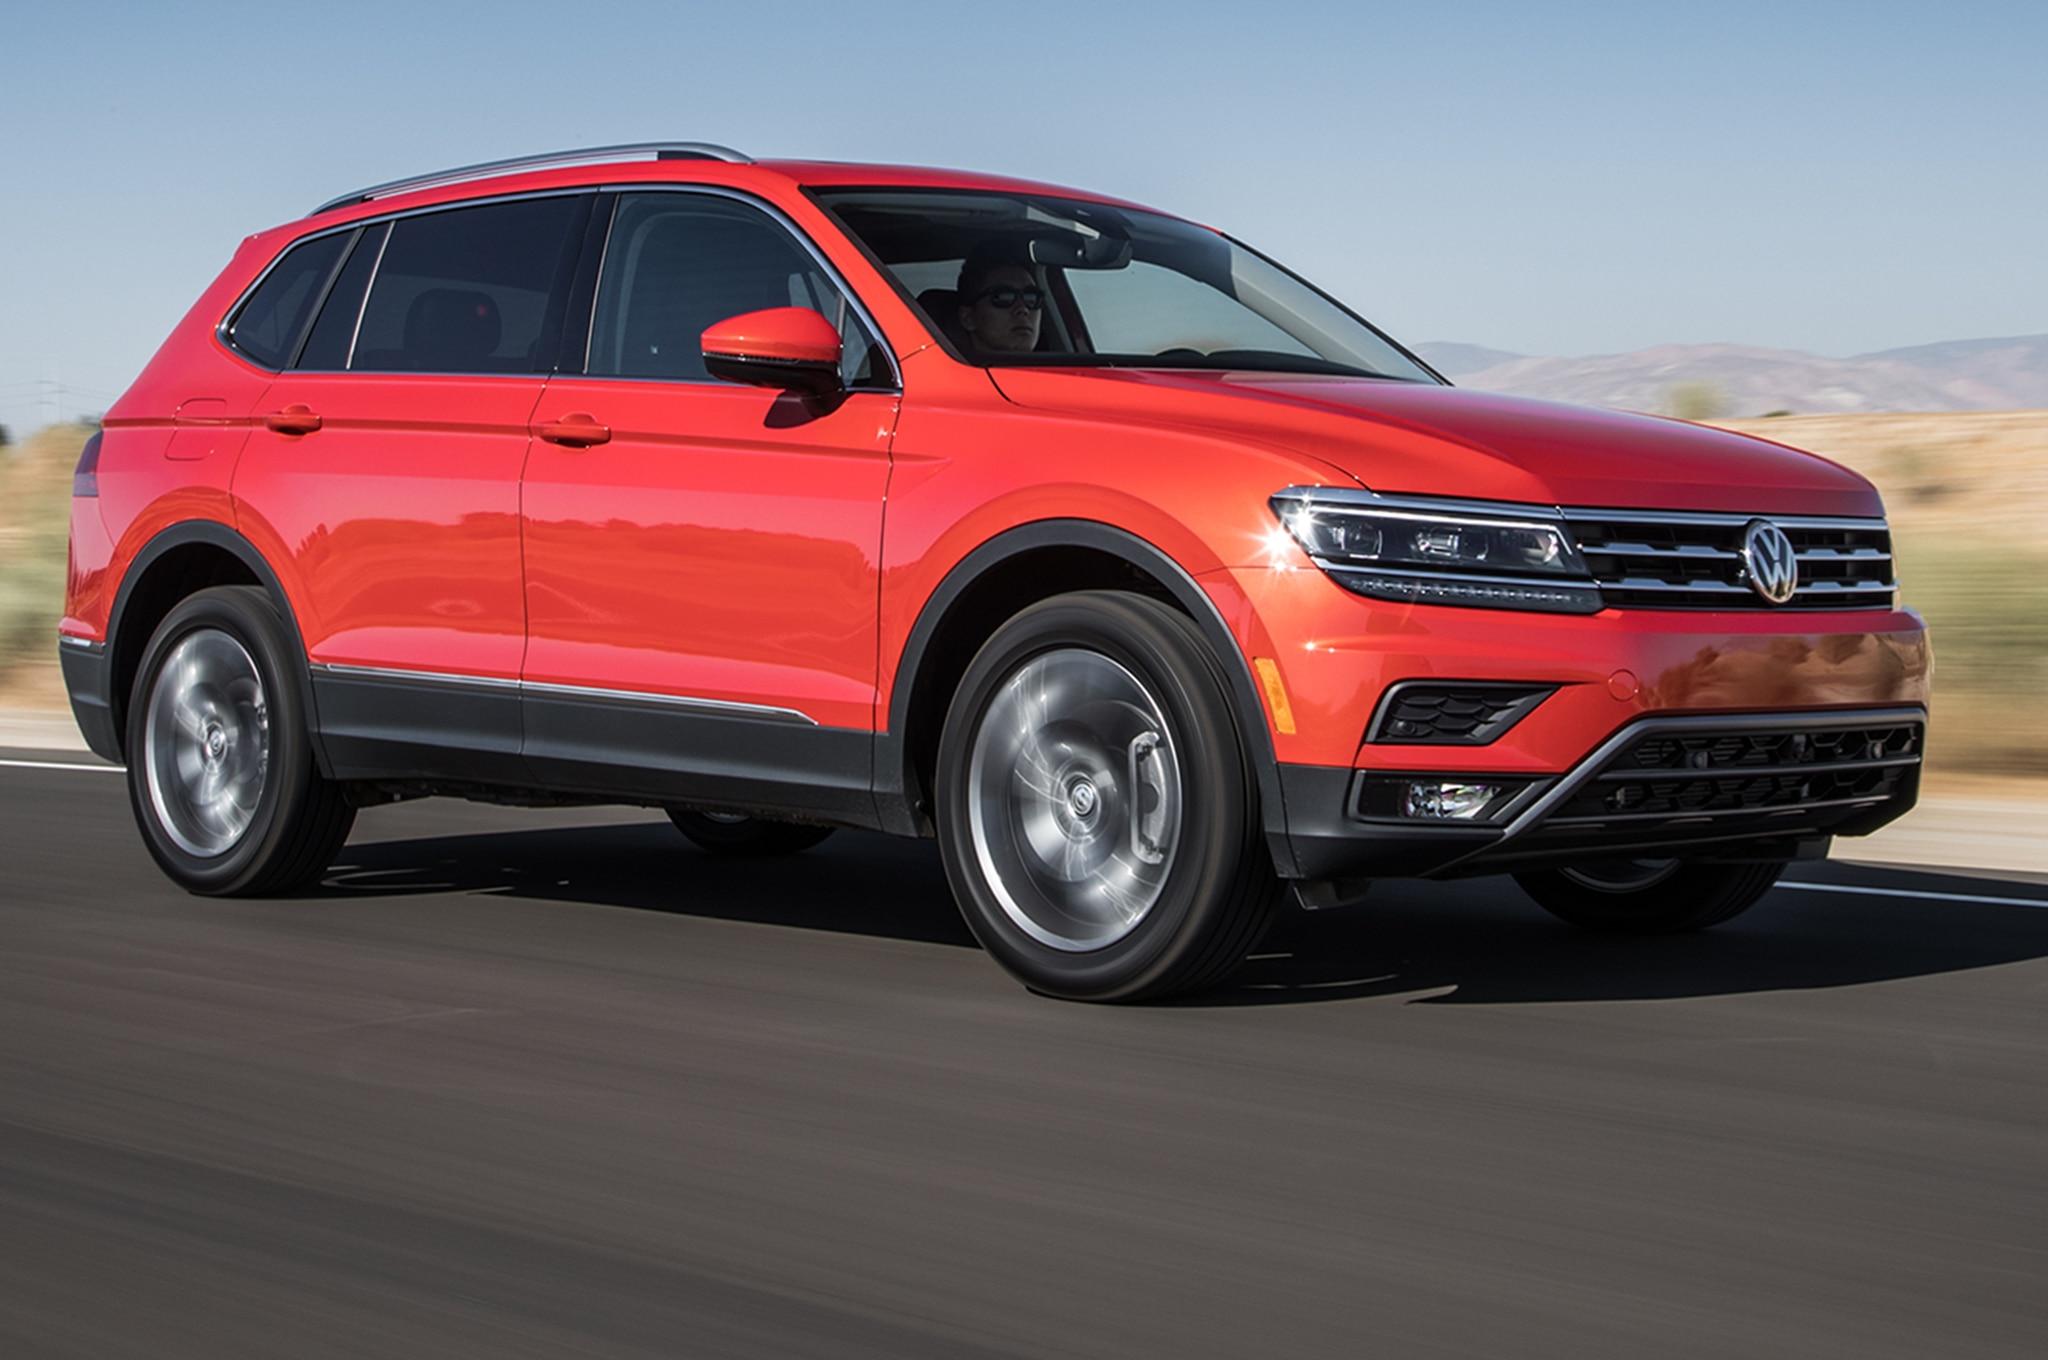 2018 Volkswagen Tiguan Front Three Quarter In Motion 02